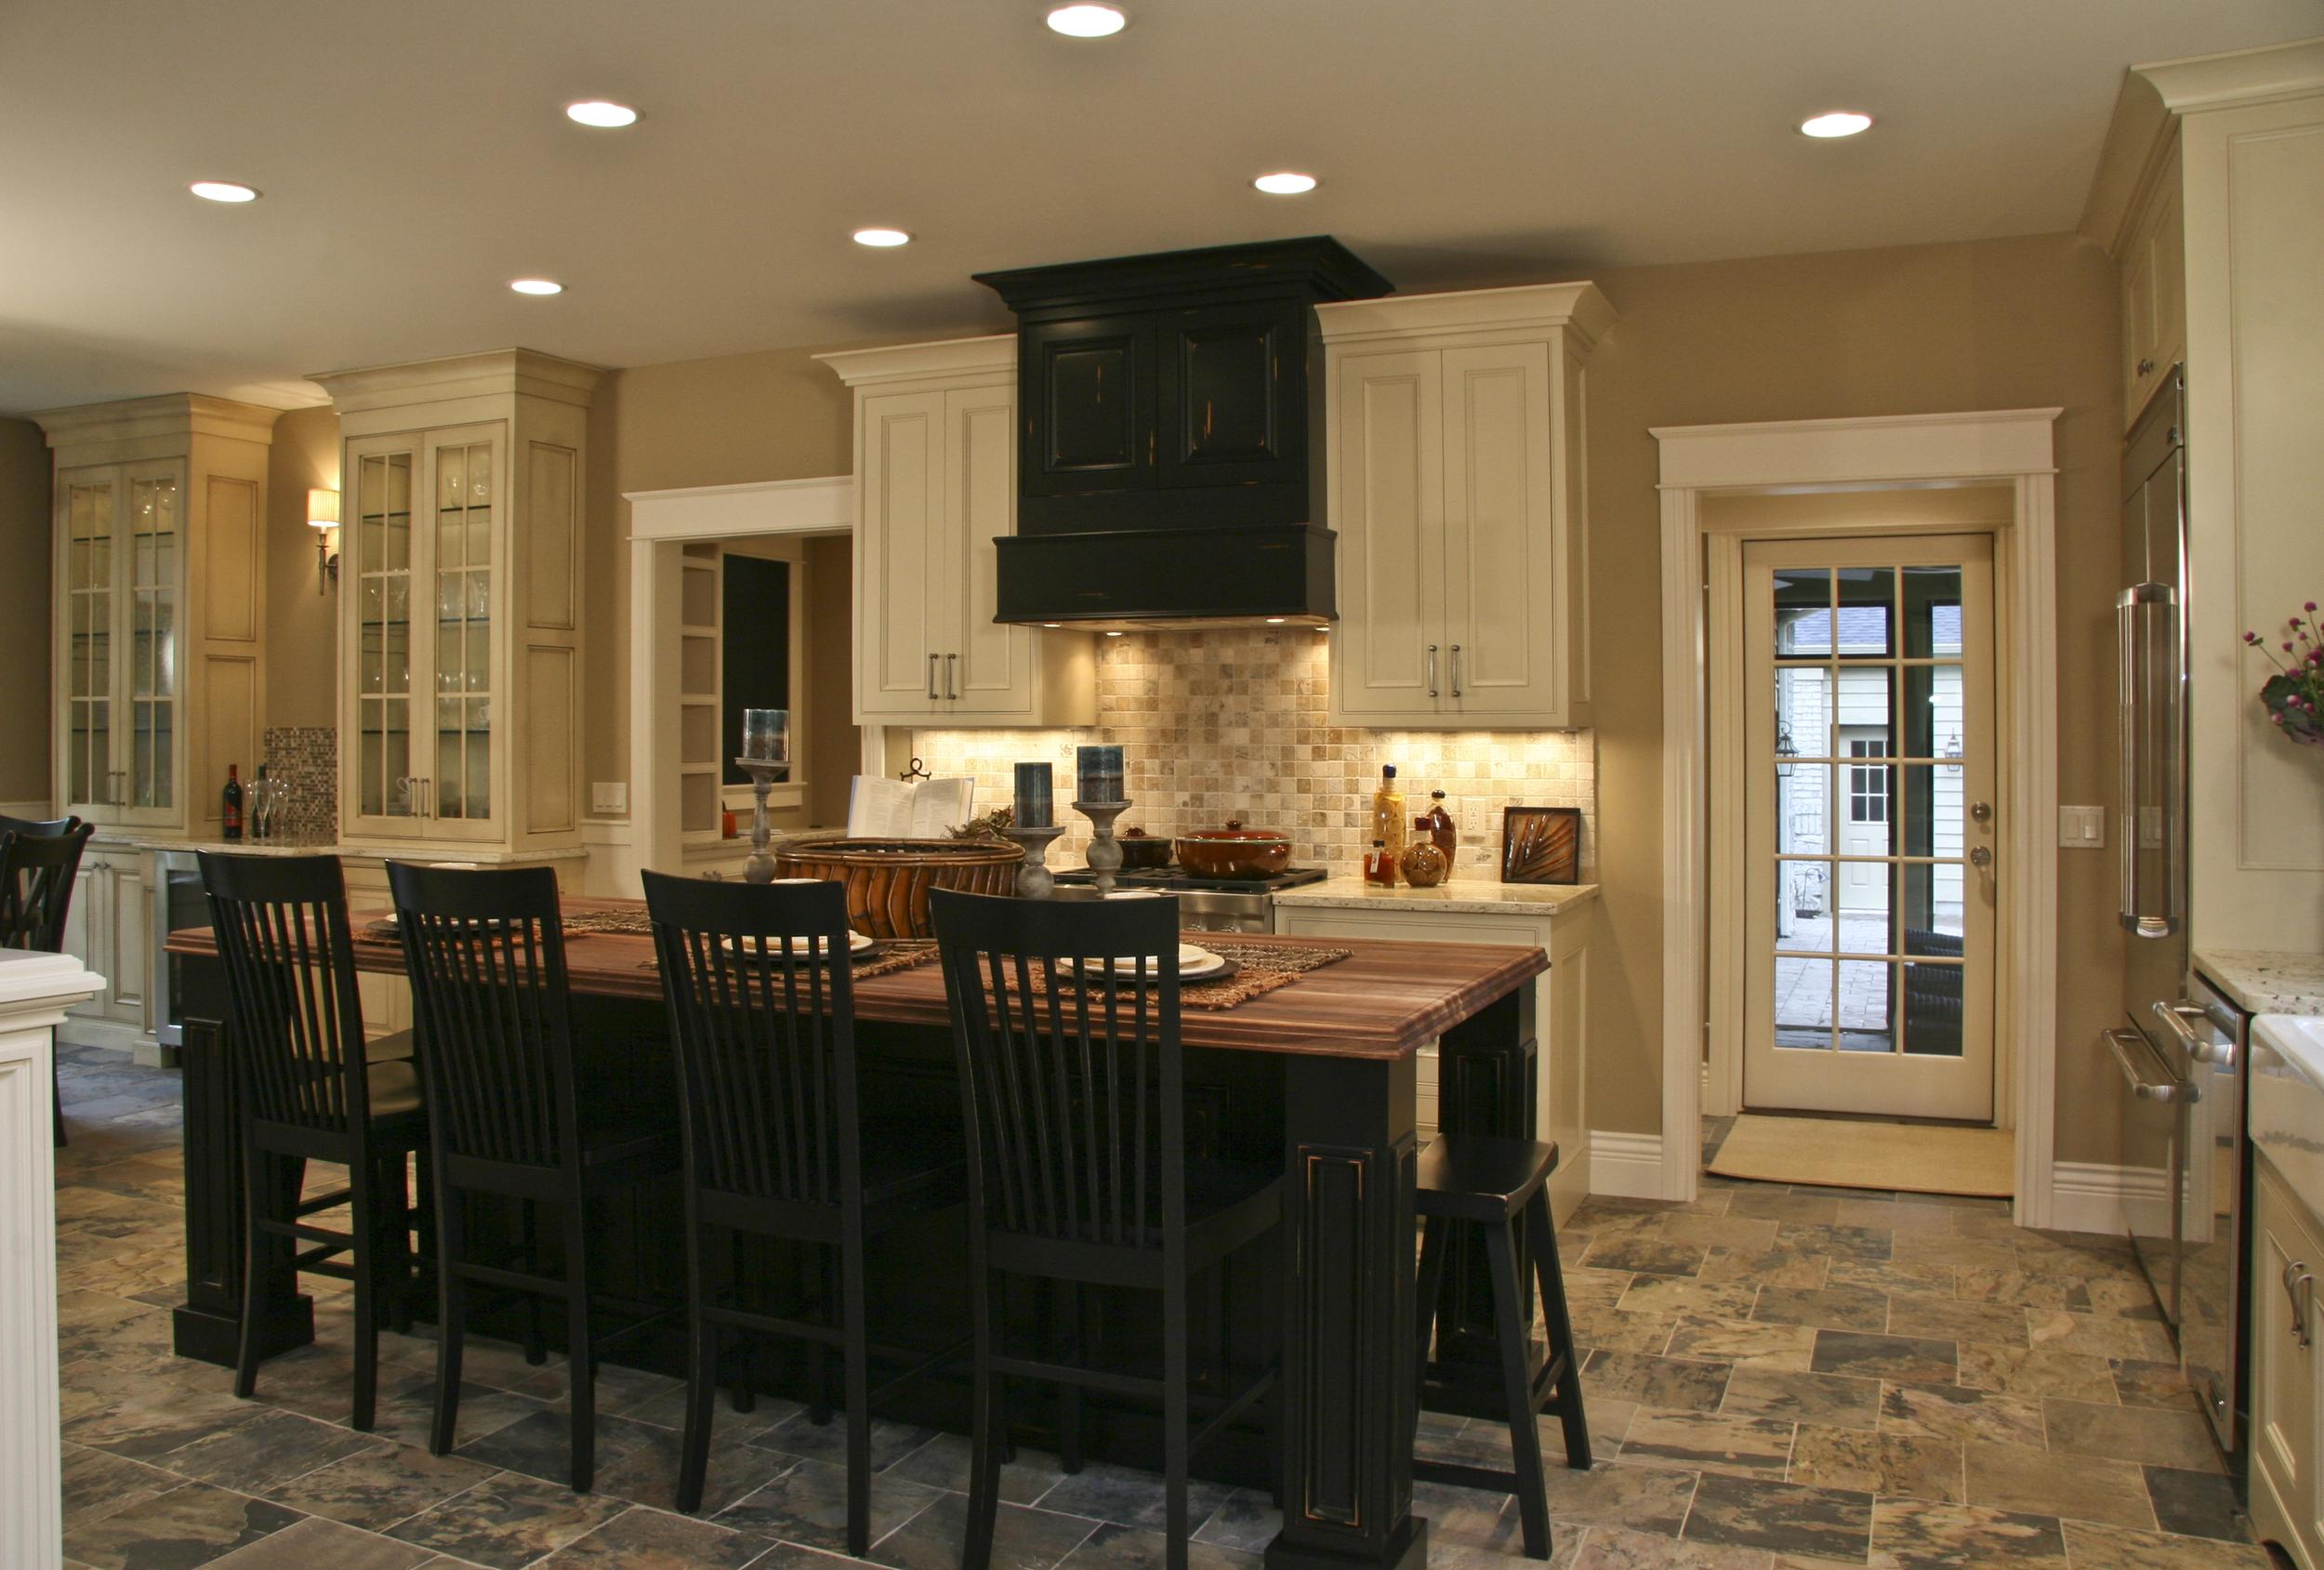 kitchen_IMG_0048-1.jpg